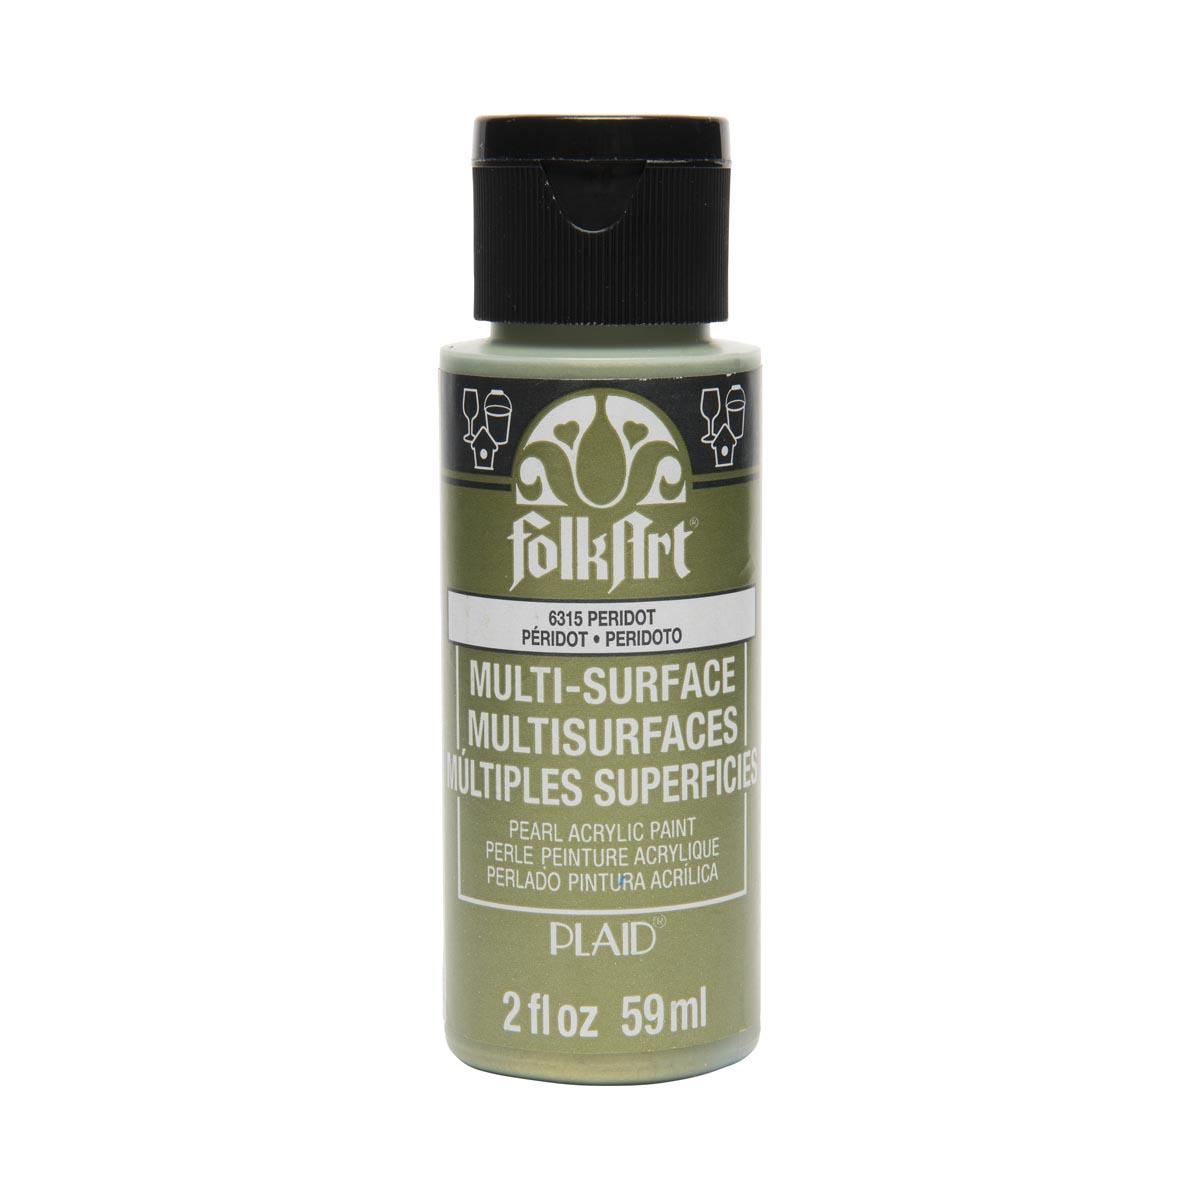 FolkArt ® Multi-Surface Pearl Acrylic Paints - Peridot, 2 oz.